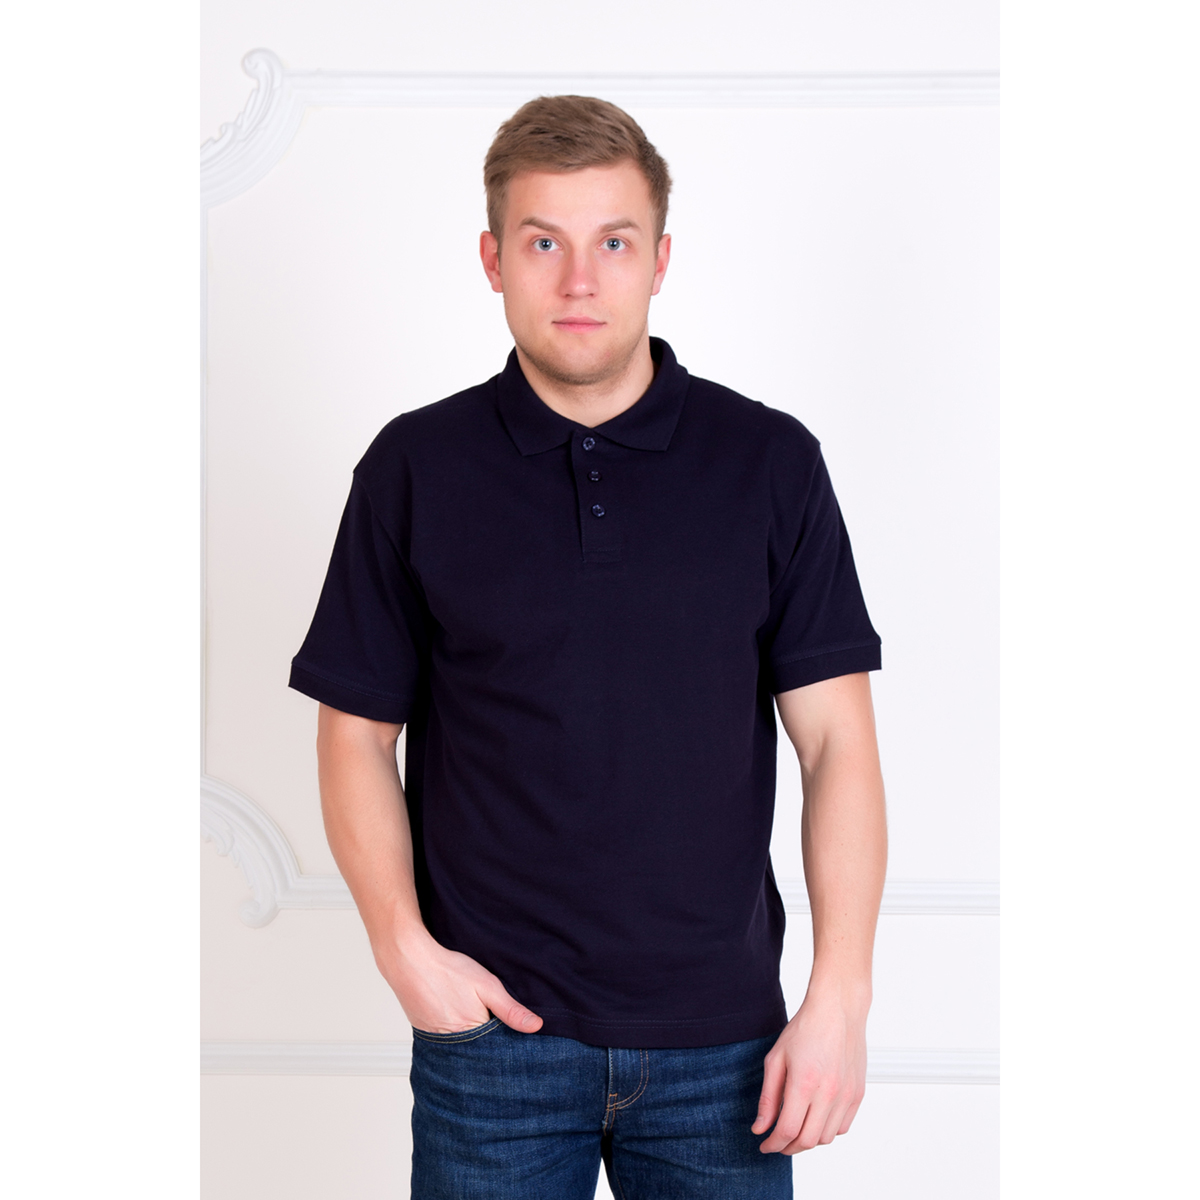 Мужская футболка-поло Макс Синий, размер 44Майки и футболки<br>Обхват груди: 88 см <br>Обхват талии: 78 см <br>Обхват бедер: 94 см <br>Рост: 170-176 см<br><br>Тип: Муж. футболка<br>Размер: 44<br>Материал: Пике